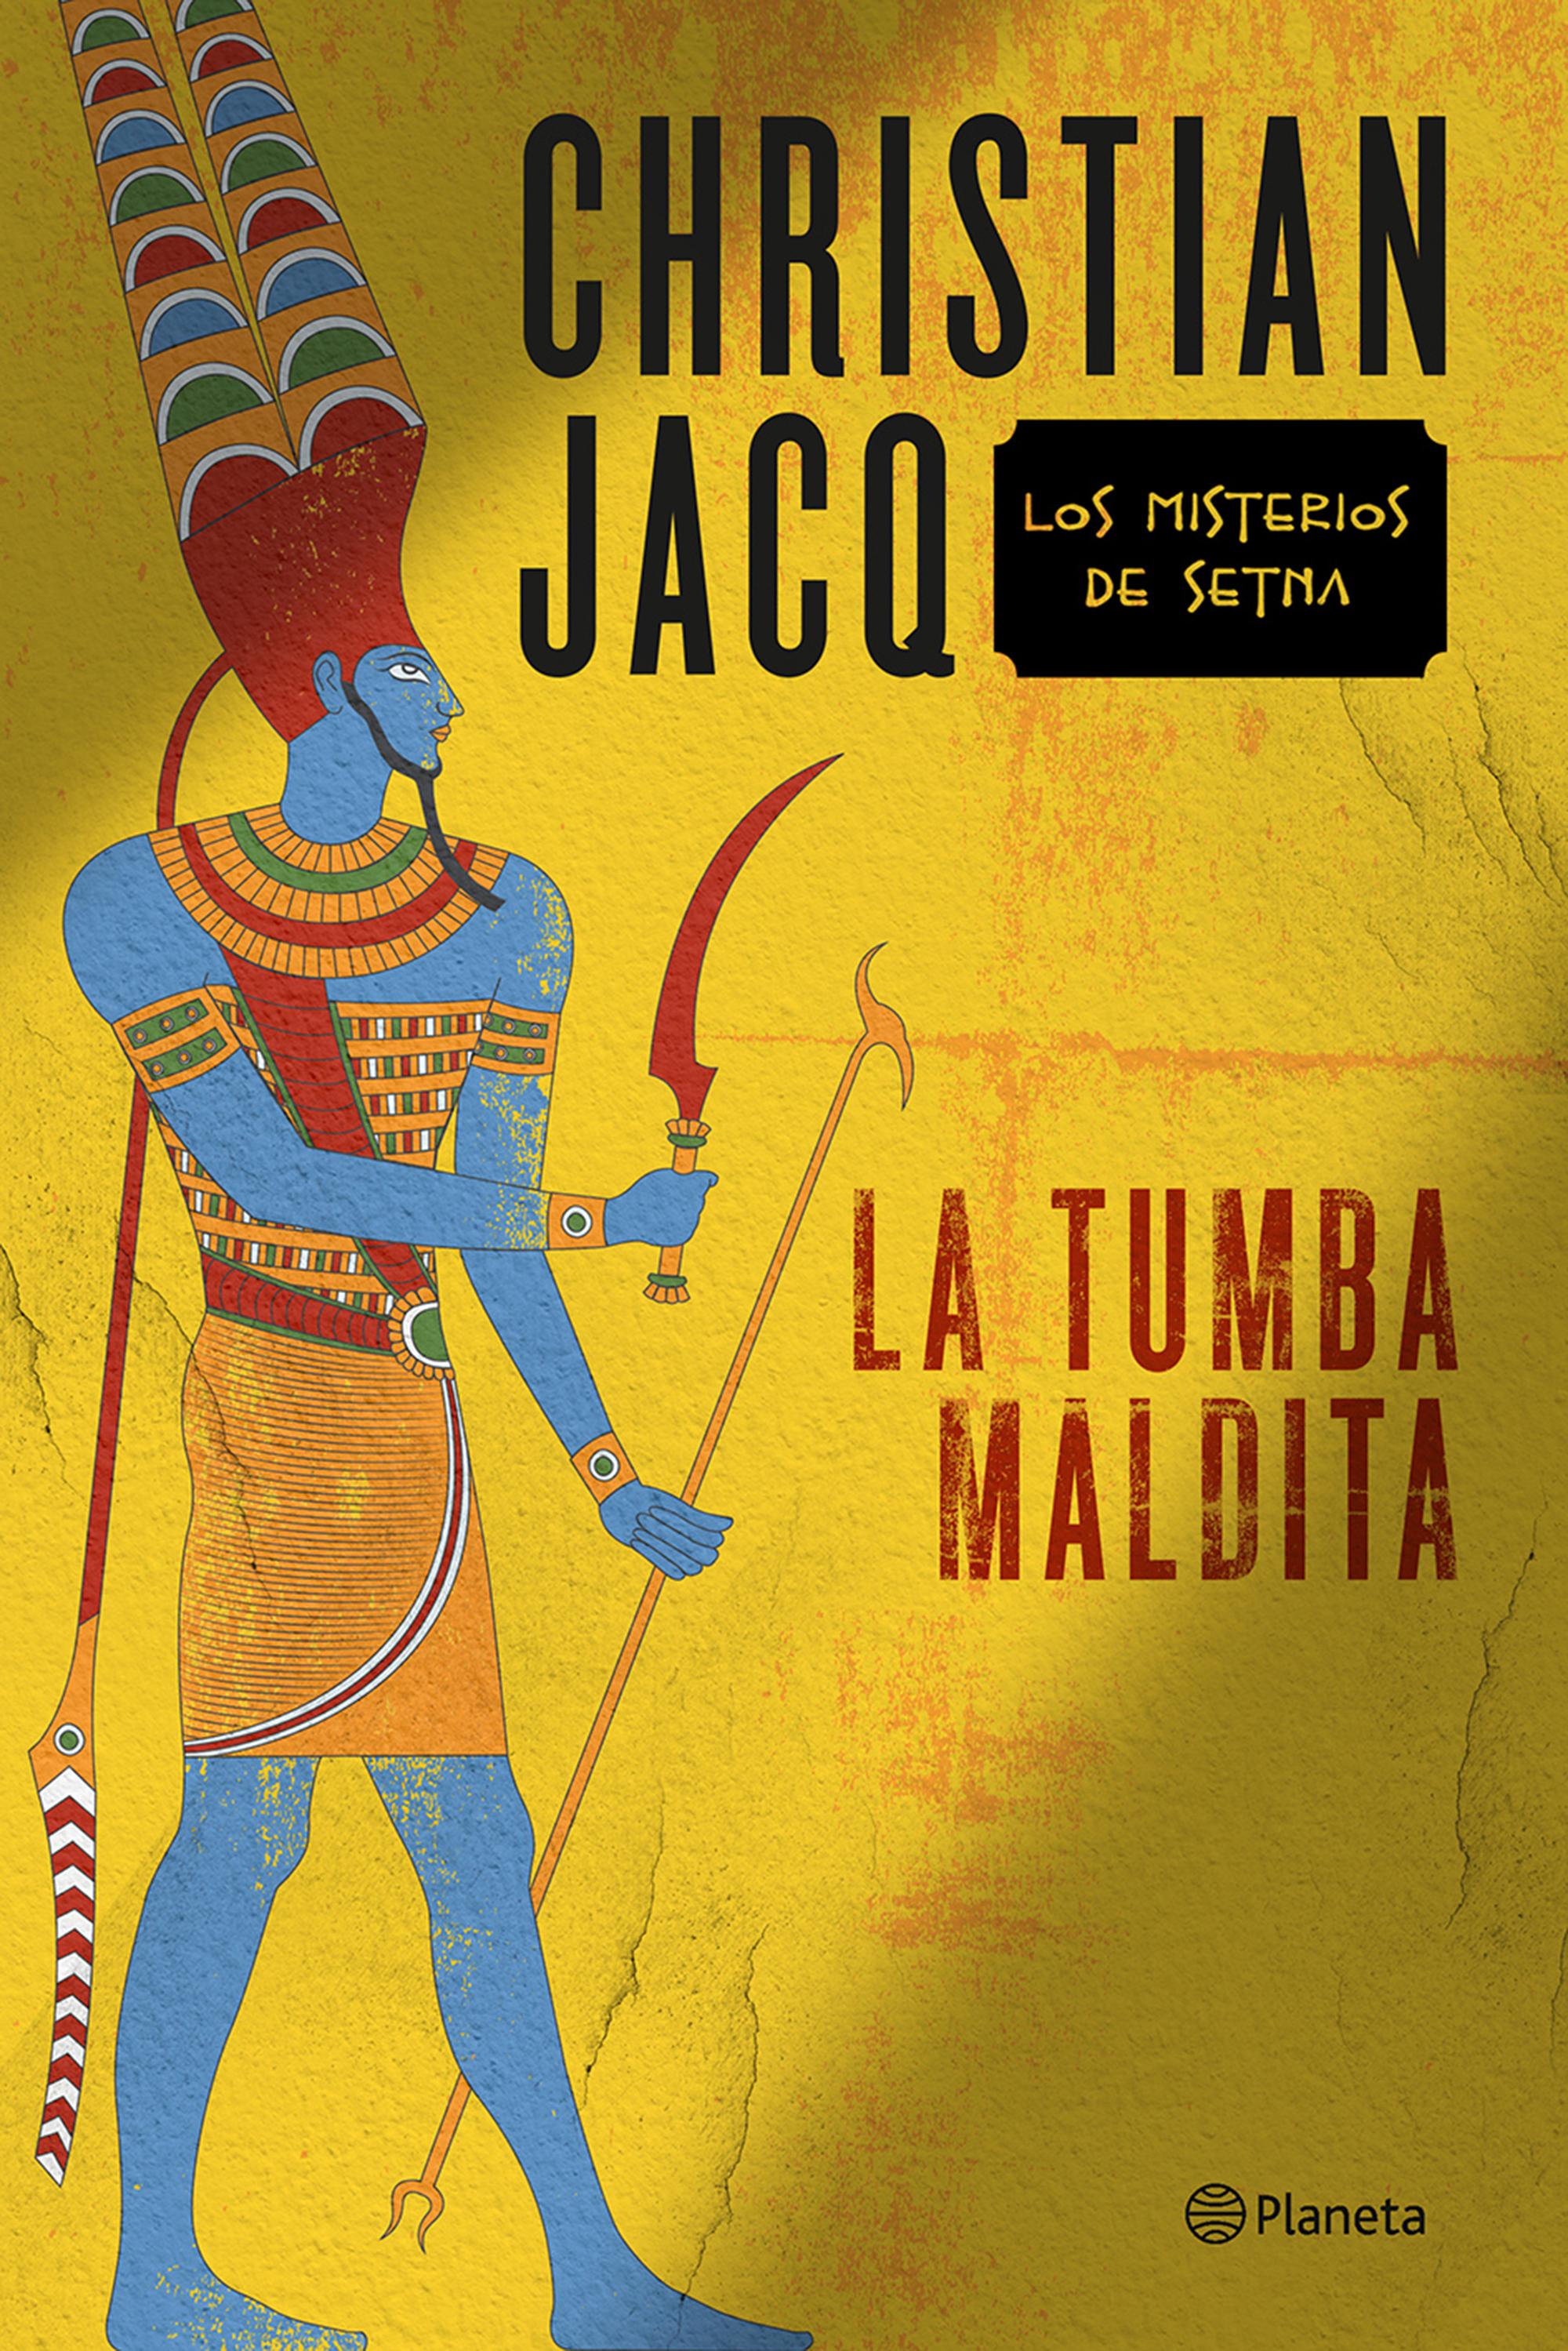 La tumba maldita - Christian Jacq Portada